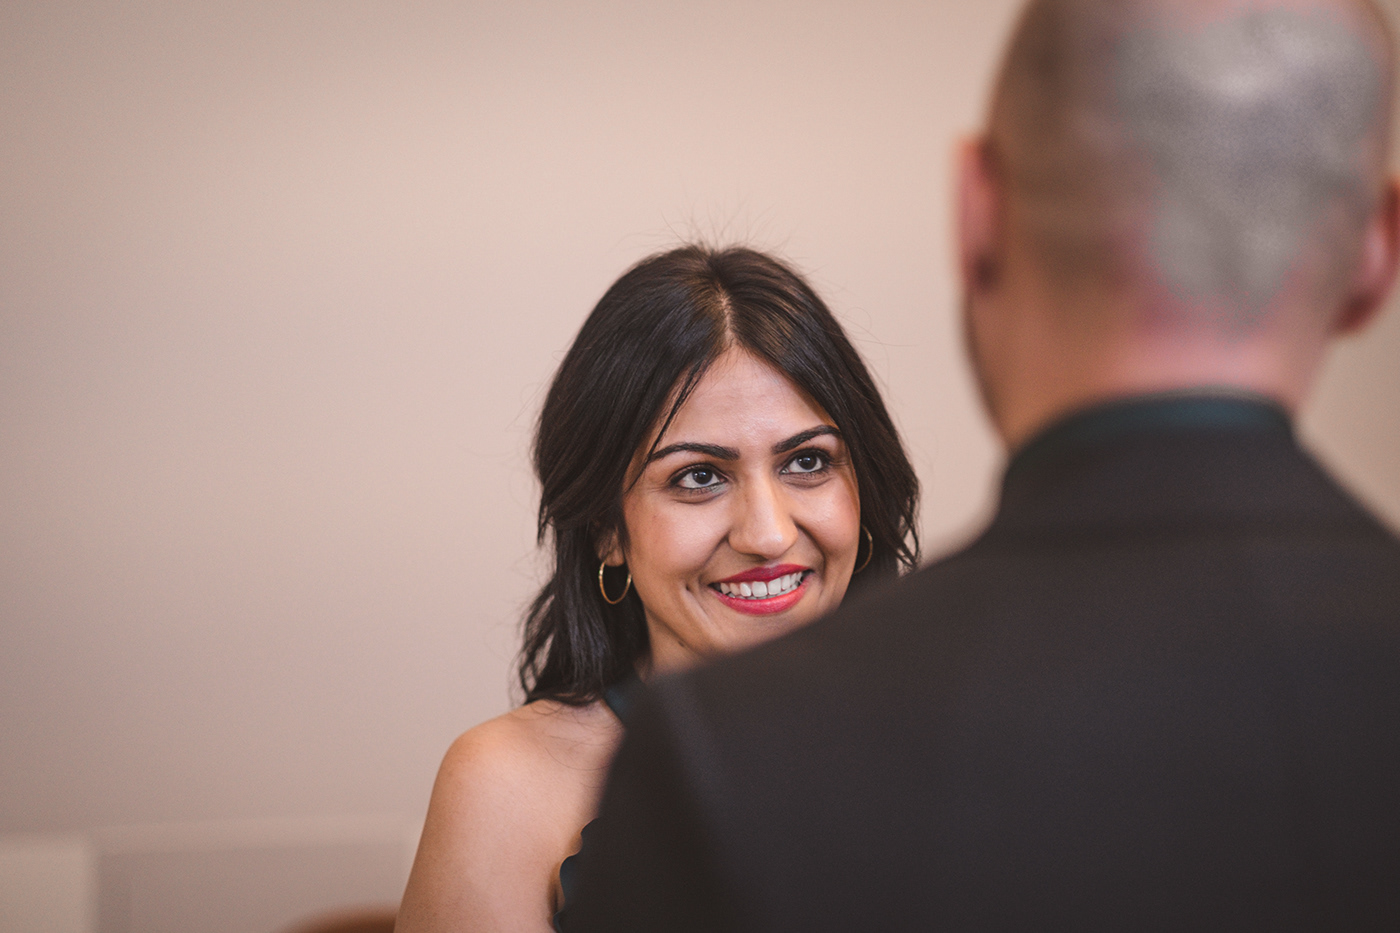 wedding Photography  Candids moments lighting